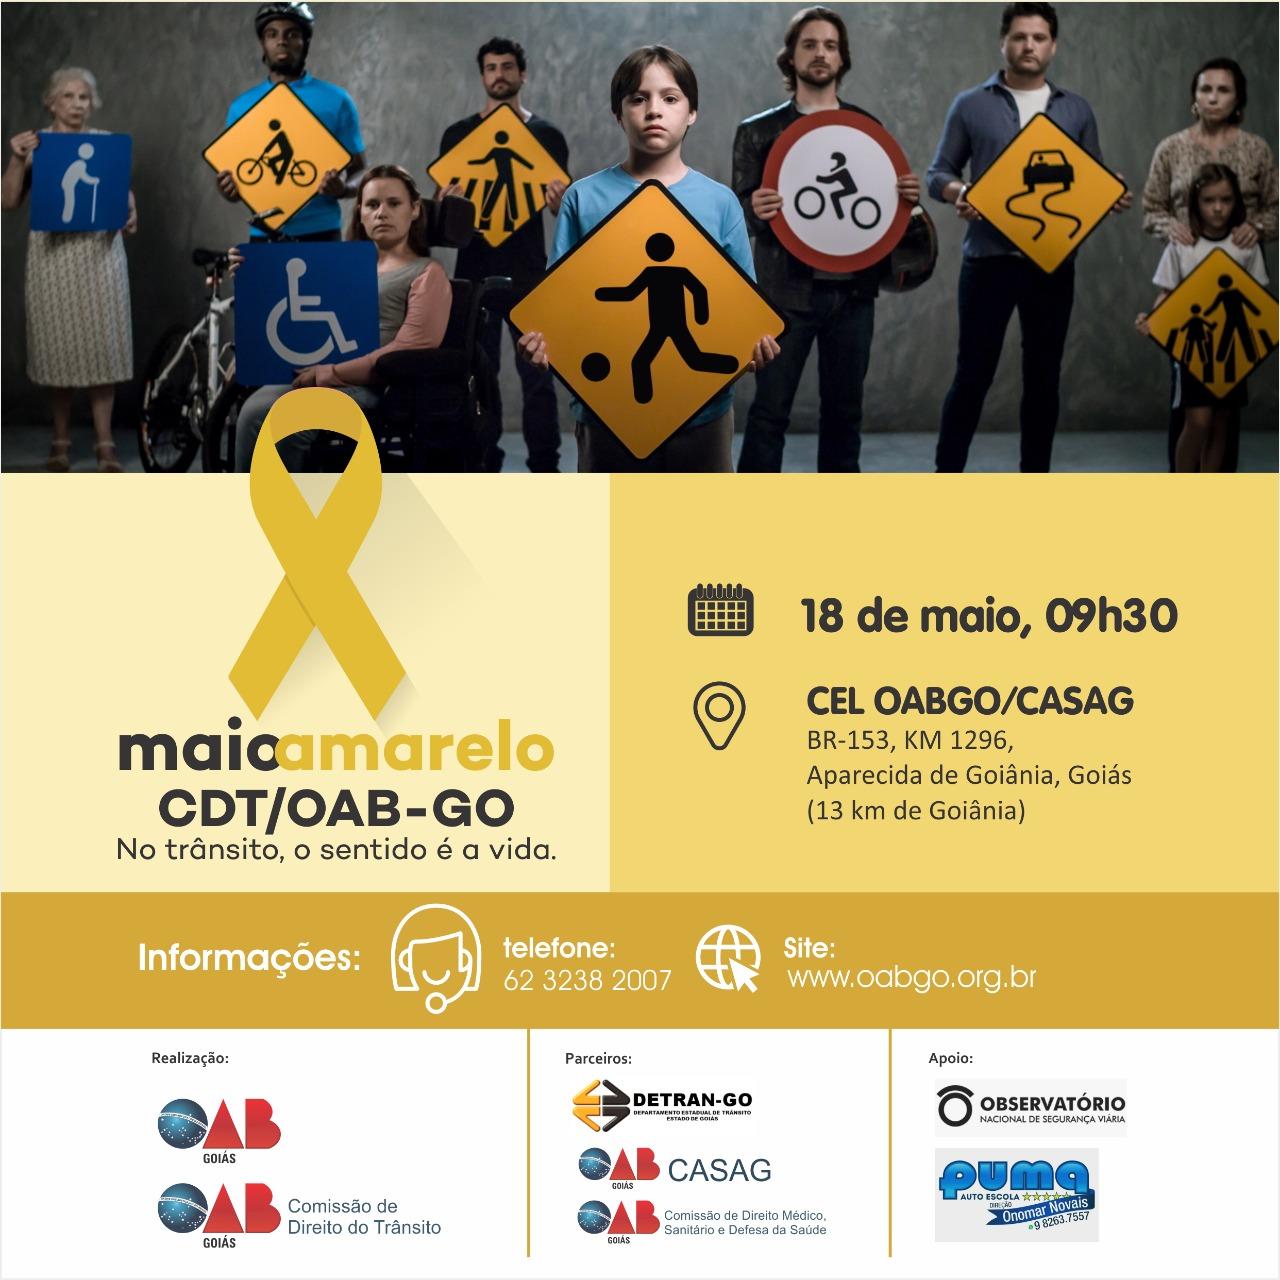 18.05 - Maio Amarelo CDT / OAB-GO